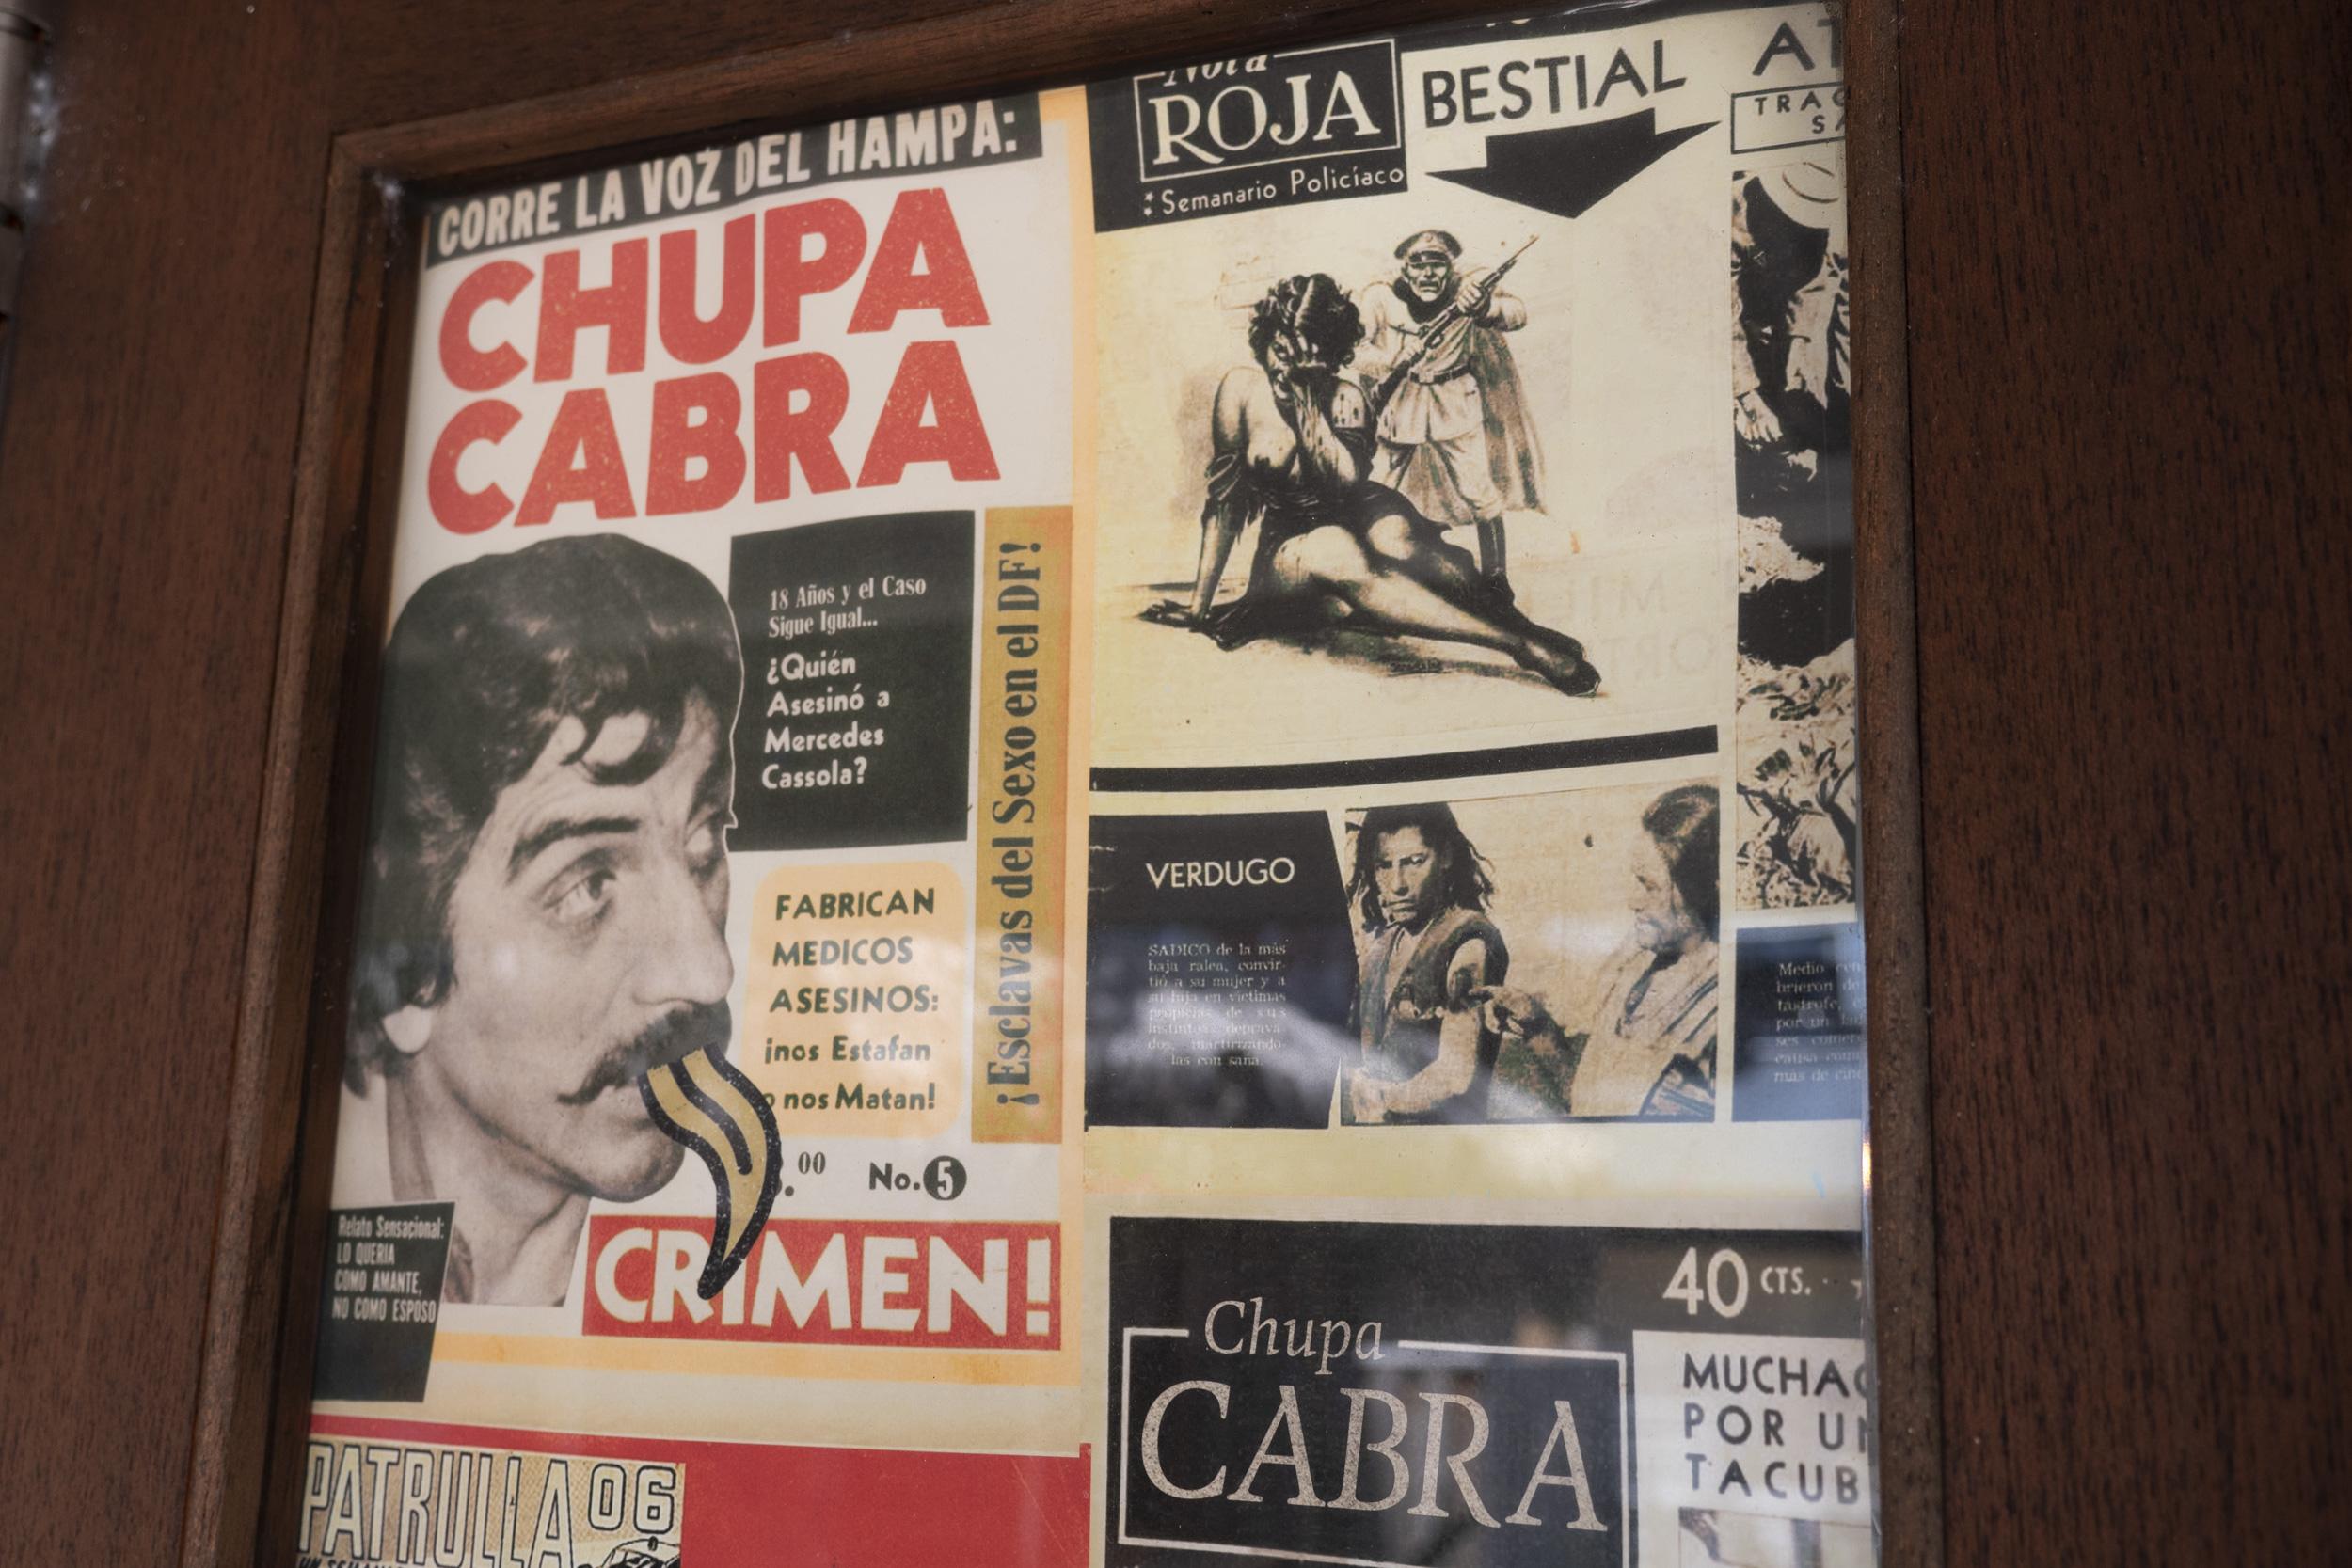 Chupacabra21.jpg